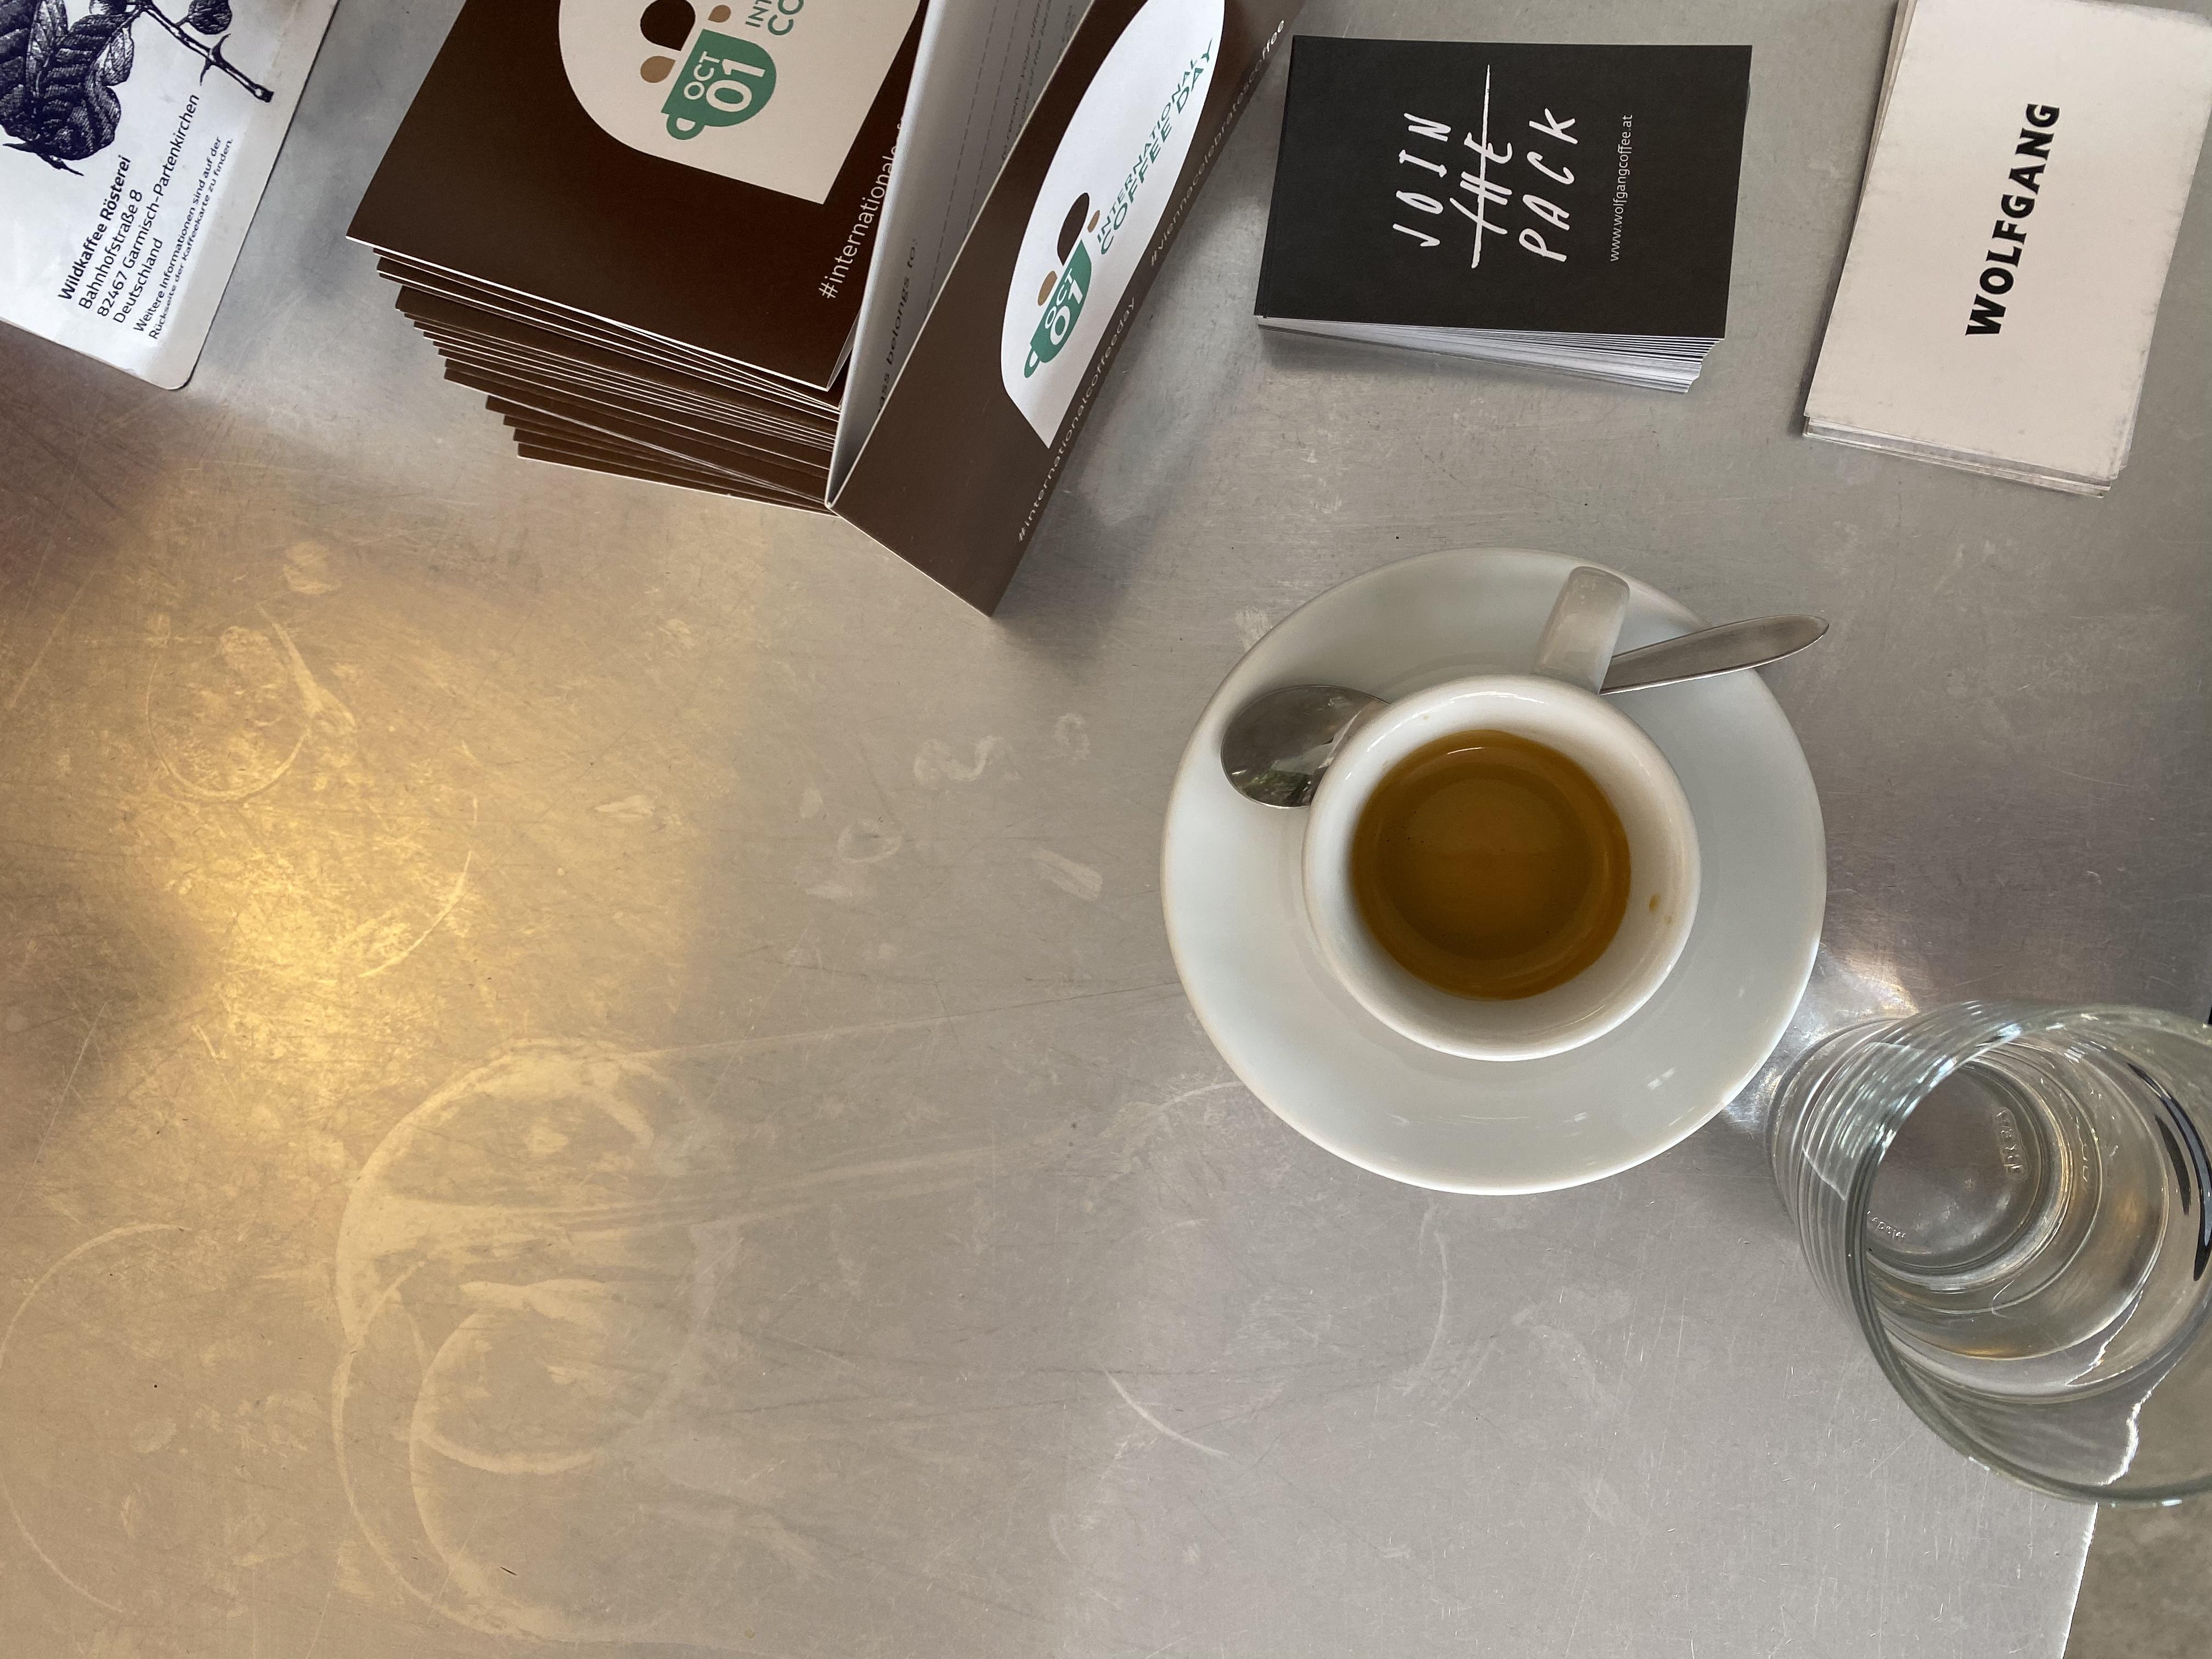 Die Coffeeshop-Aktion zum Tag des Kaffees 4